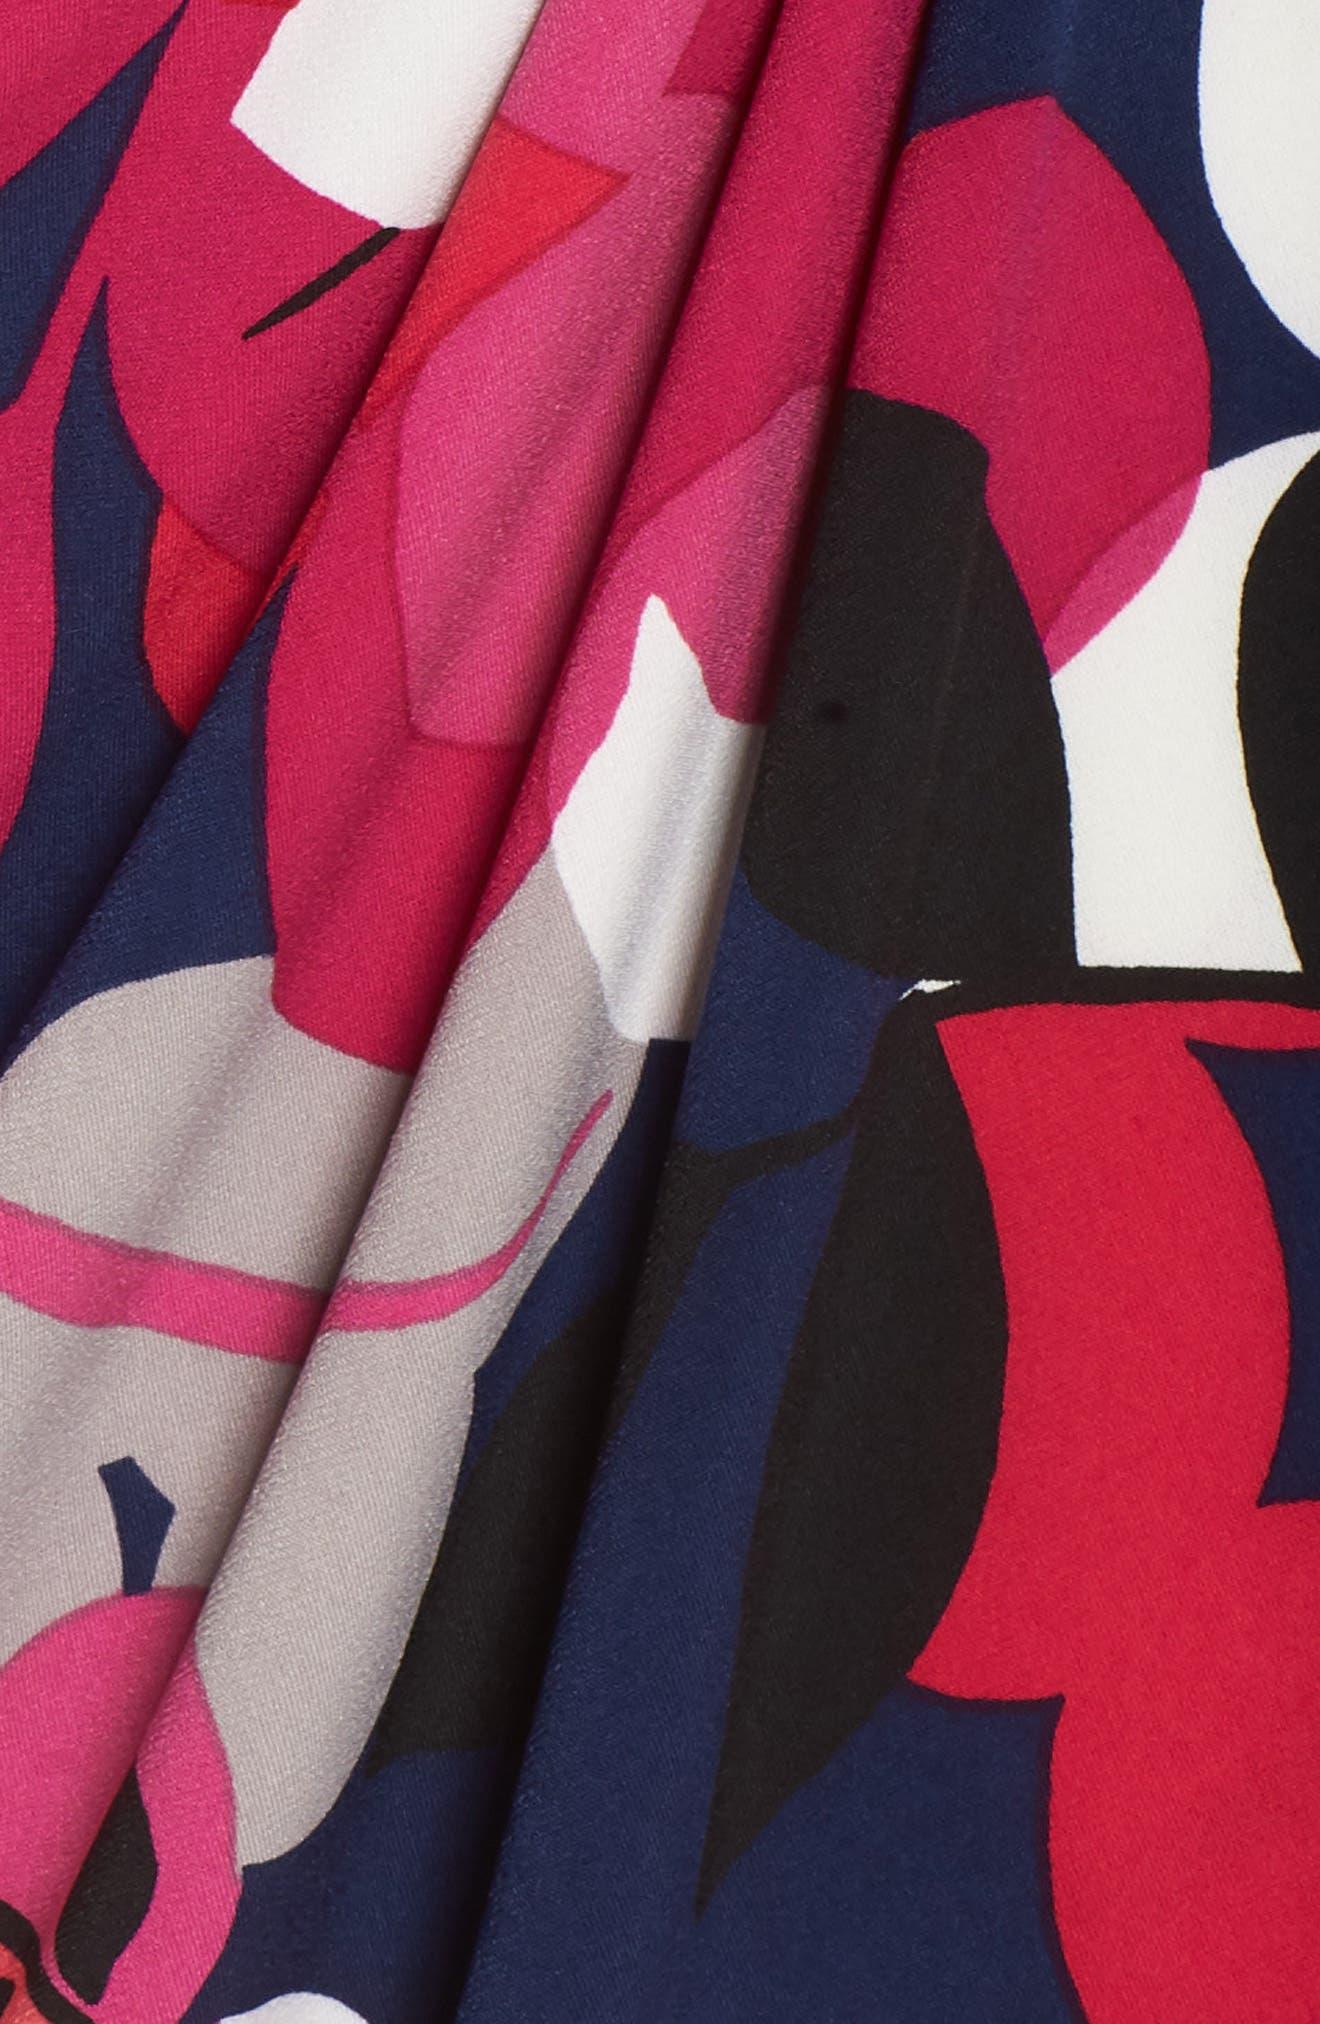 Berry Floral Wrap Dress,                             Alternate thumbnail 6, color,                             Navy/ Berry